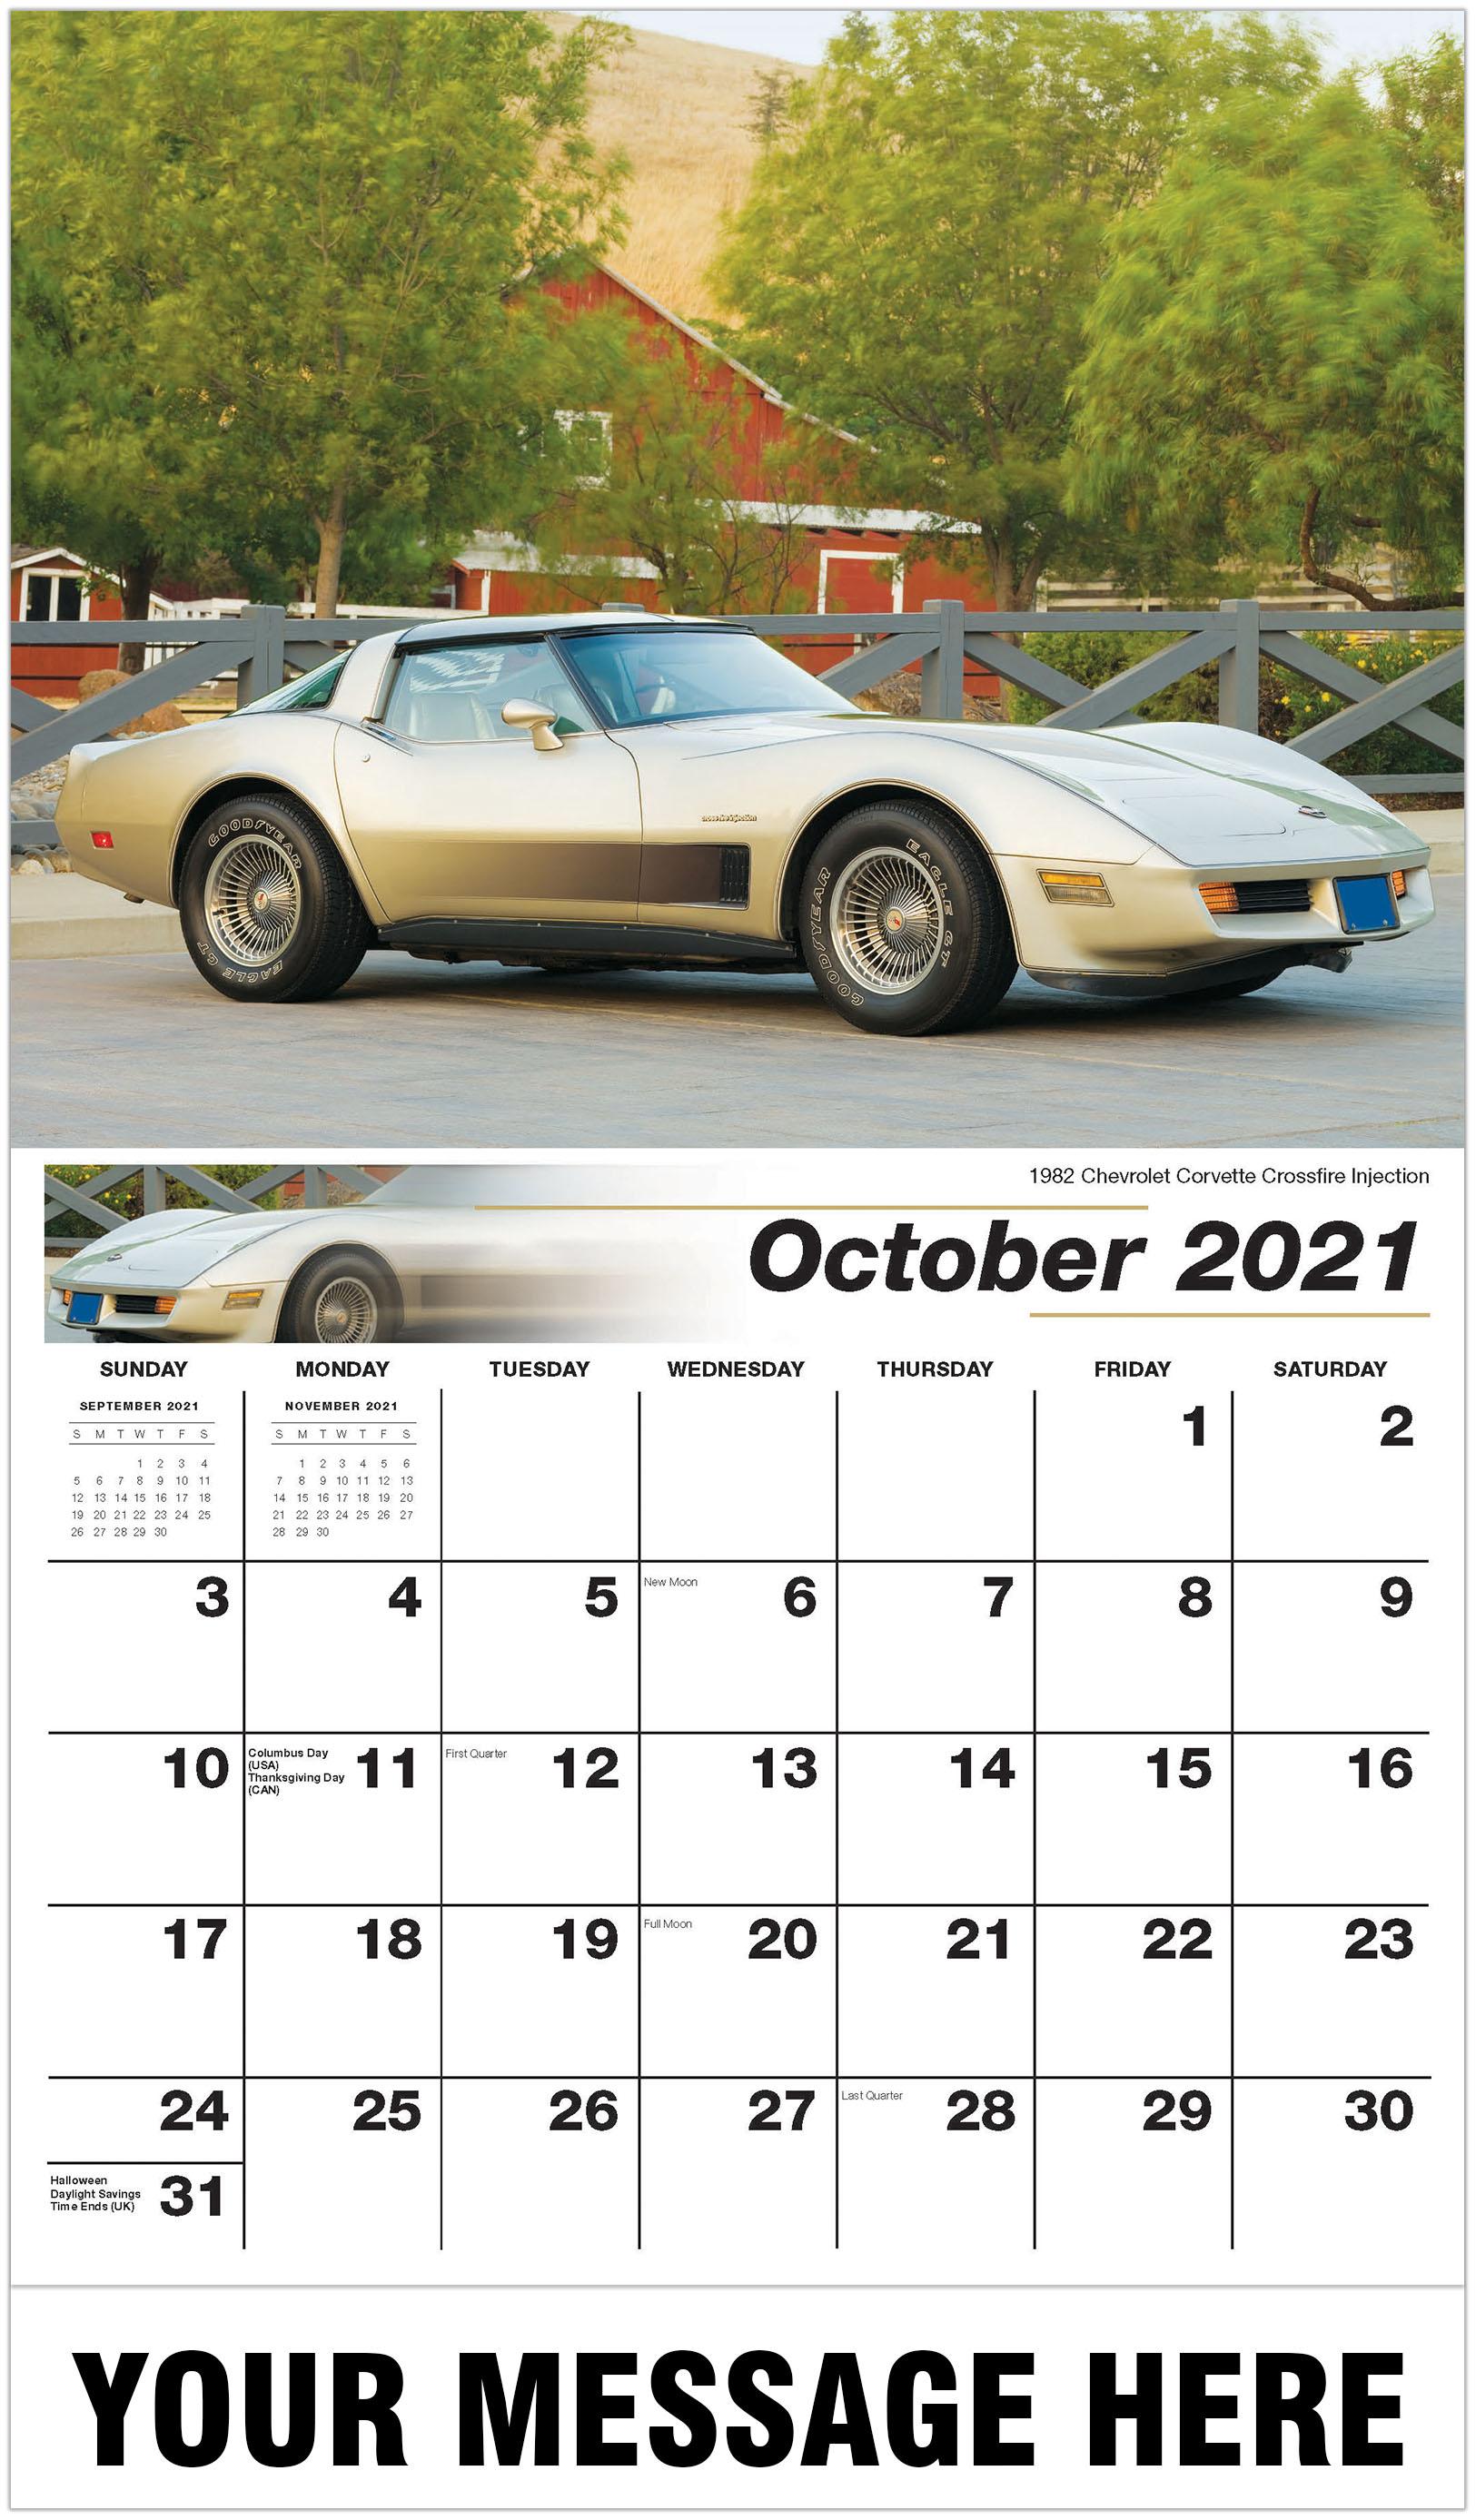 2021 Car Calendar 2021 Promotional Calendar | Classic Car Business Promo Calendars